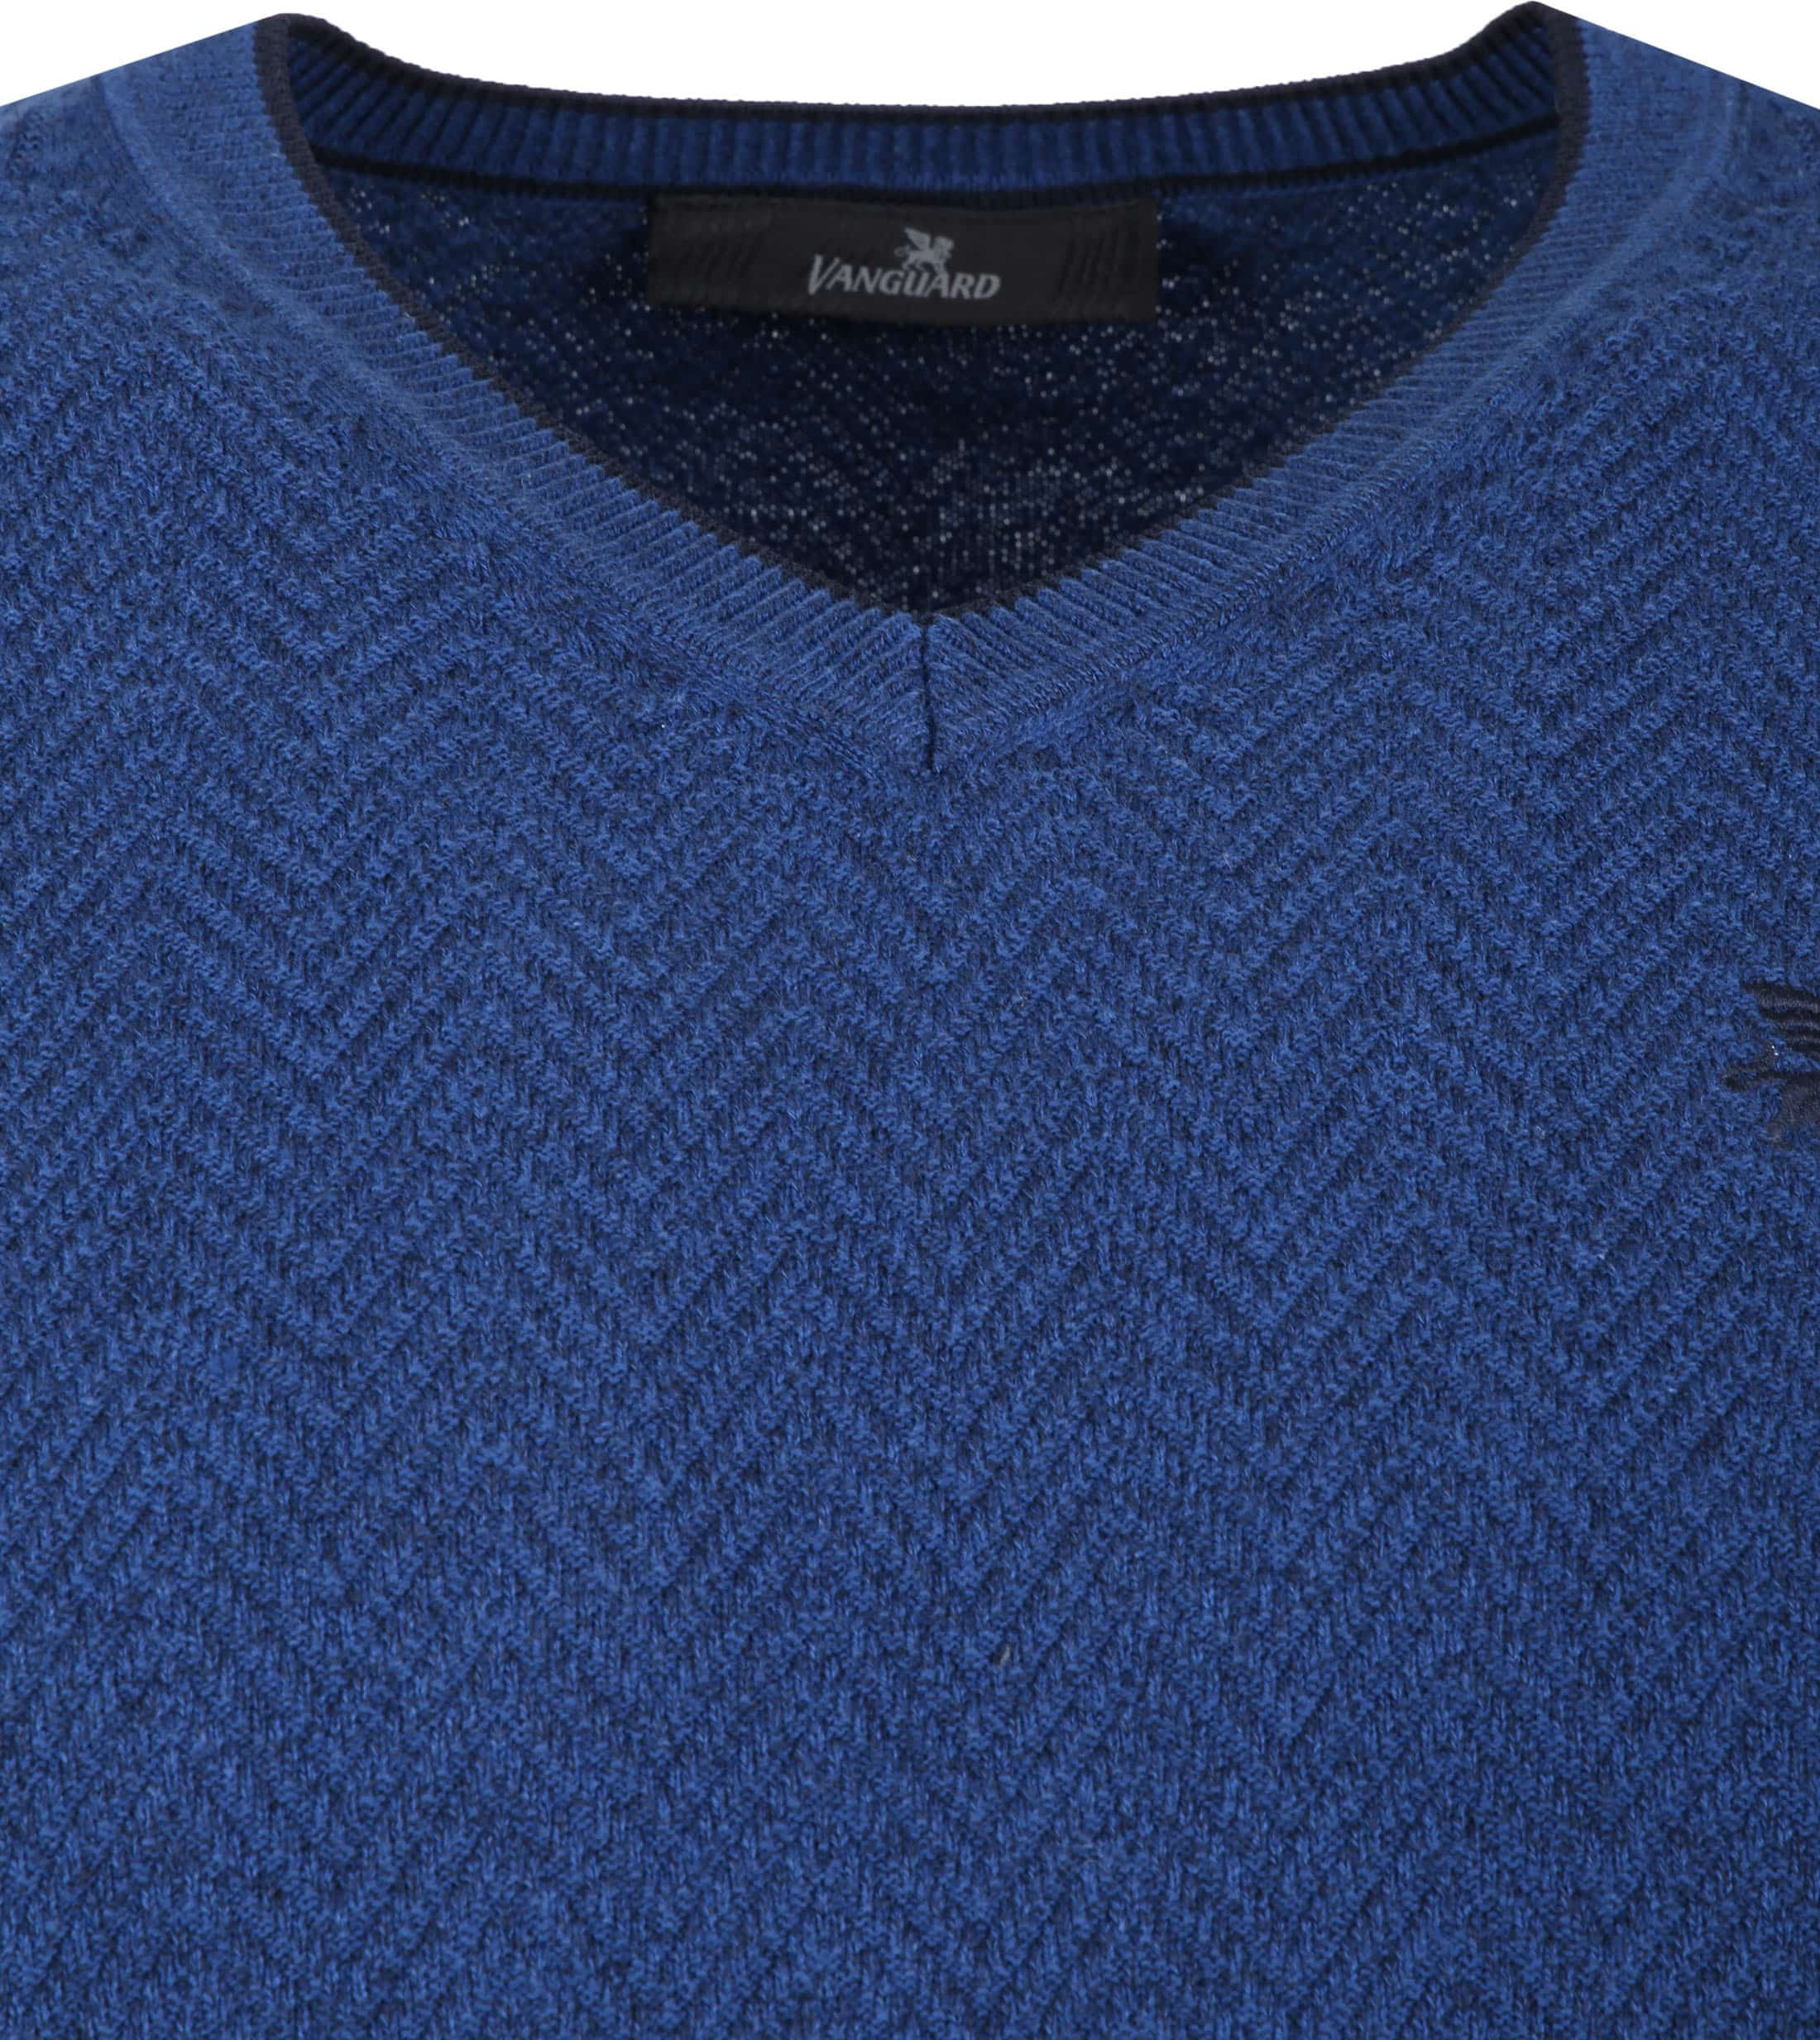 Vanguard Pullover Blauw foto 1